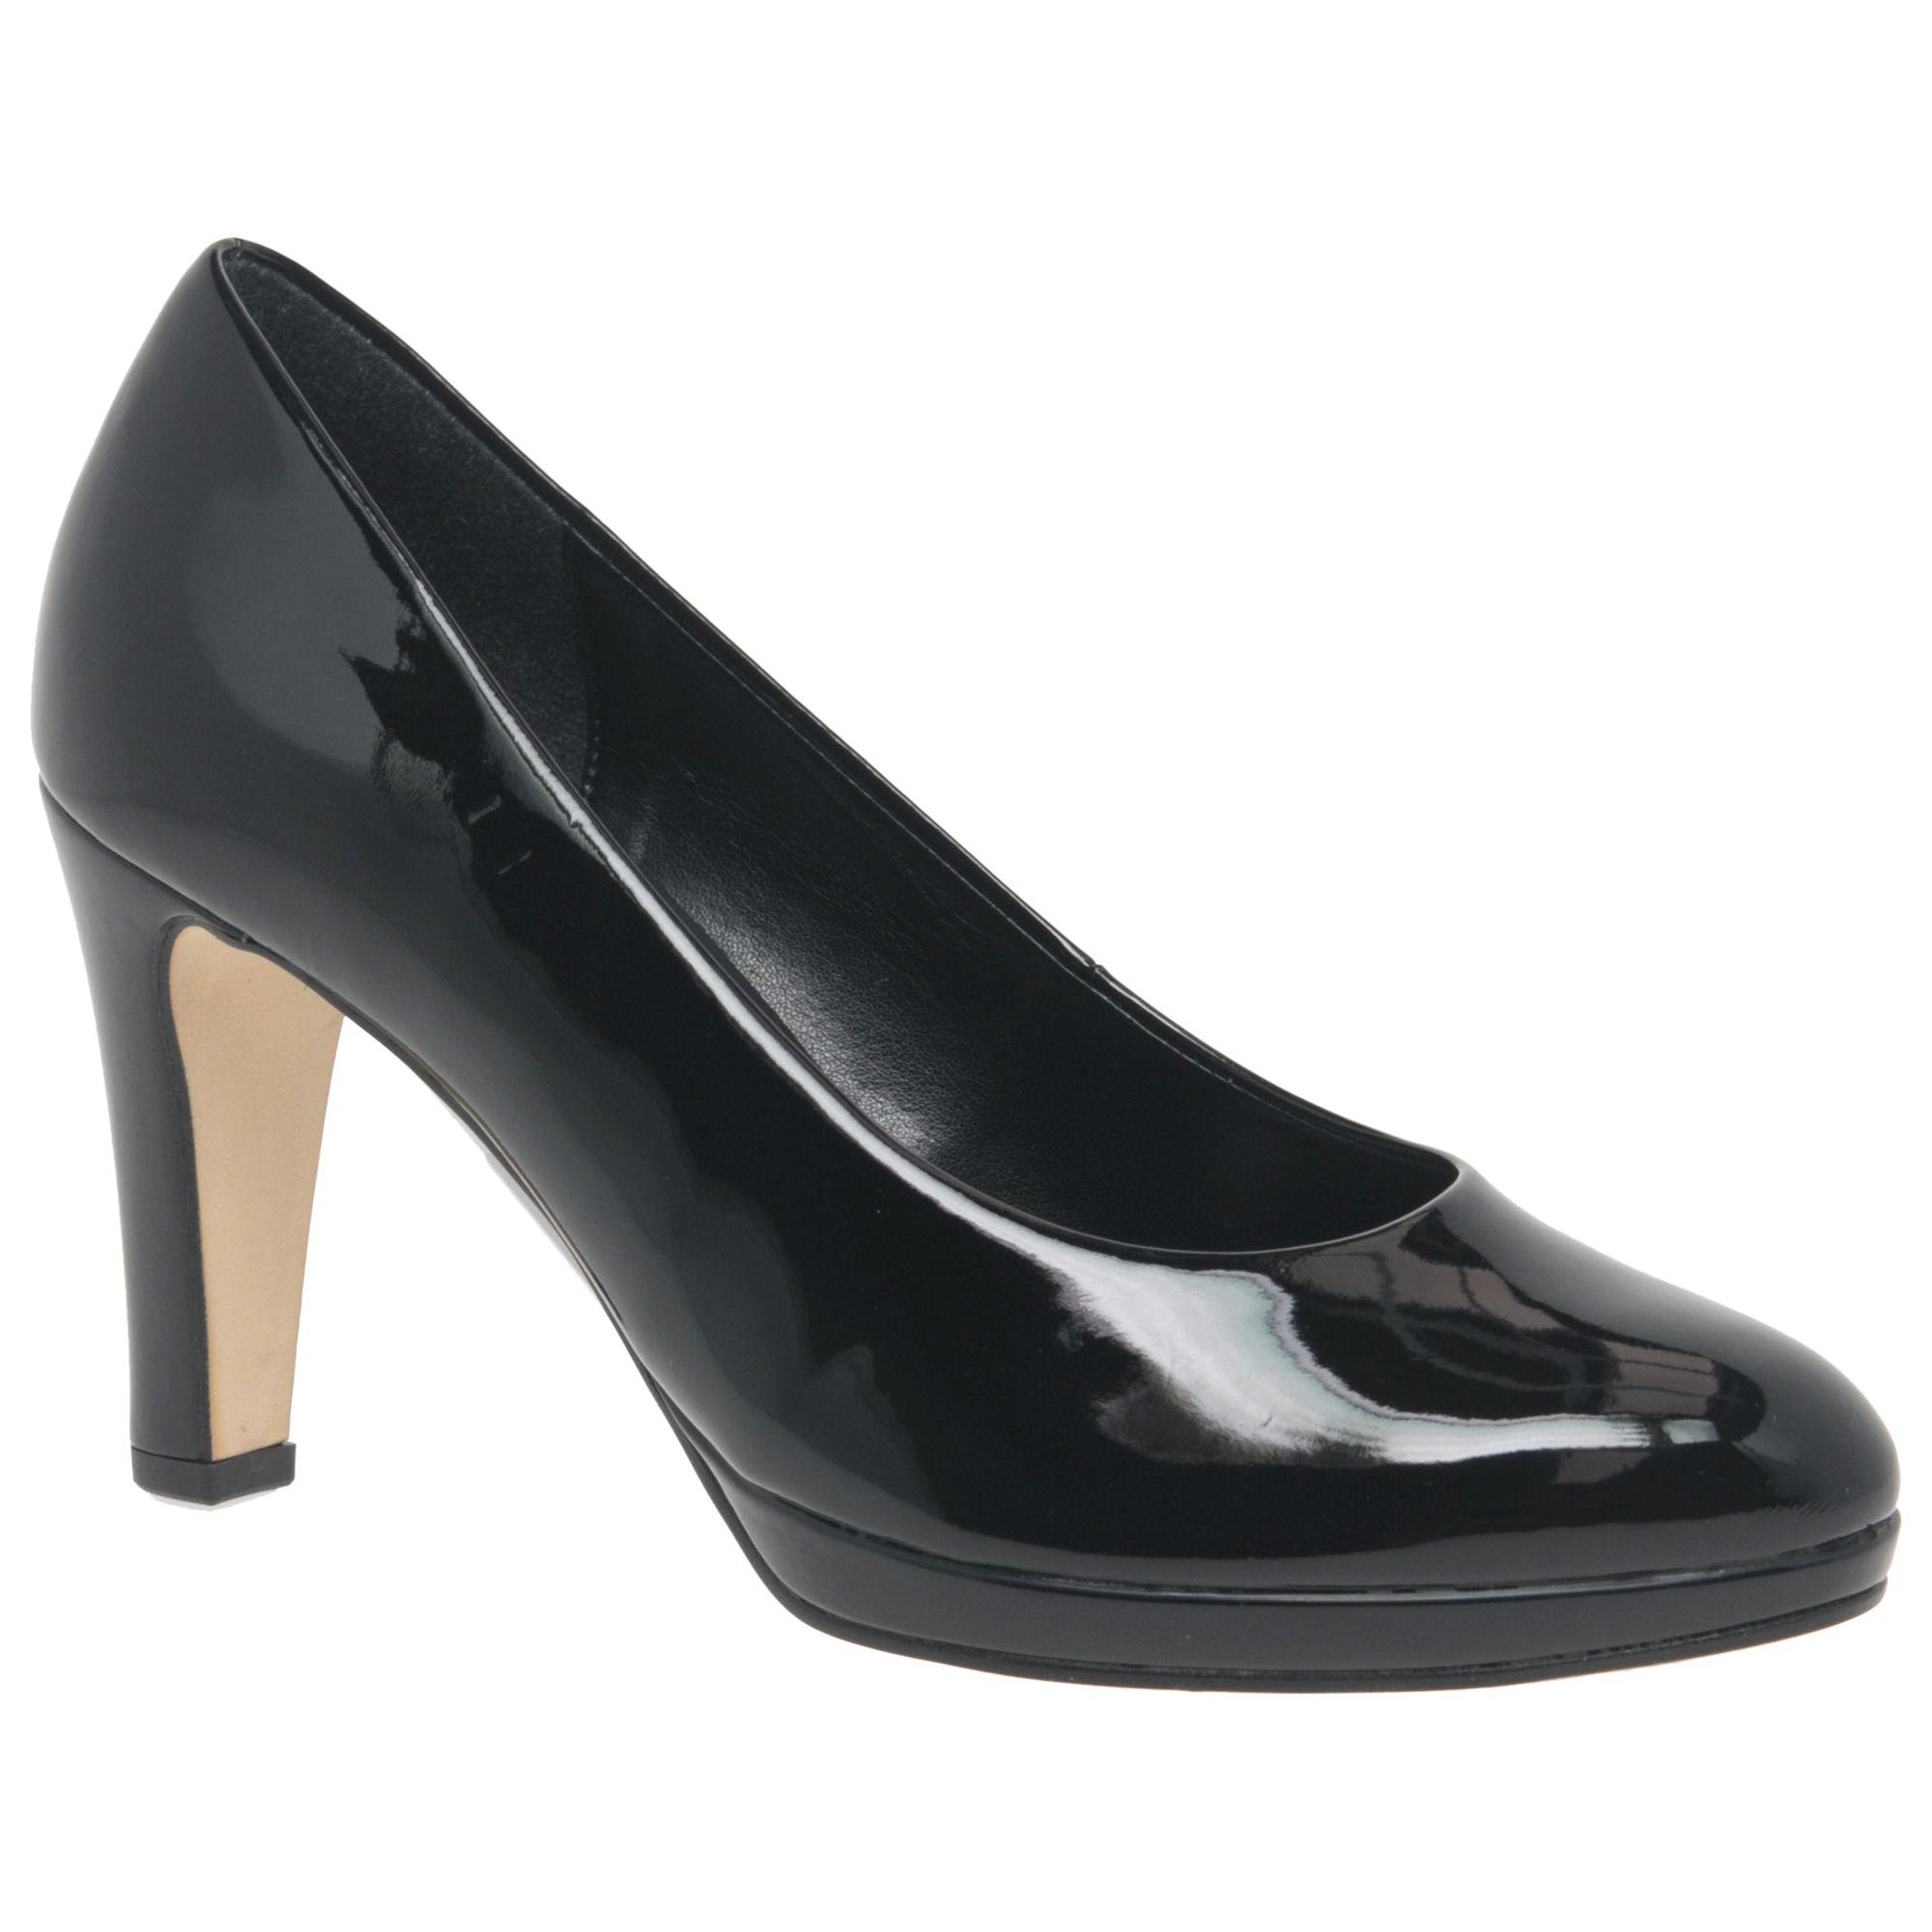 294ecdbe690 Gabor Splendid Block Heeled Court Shoes